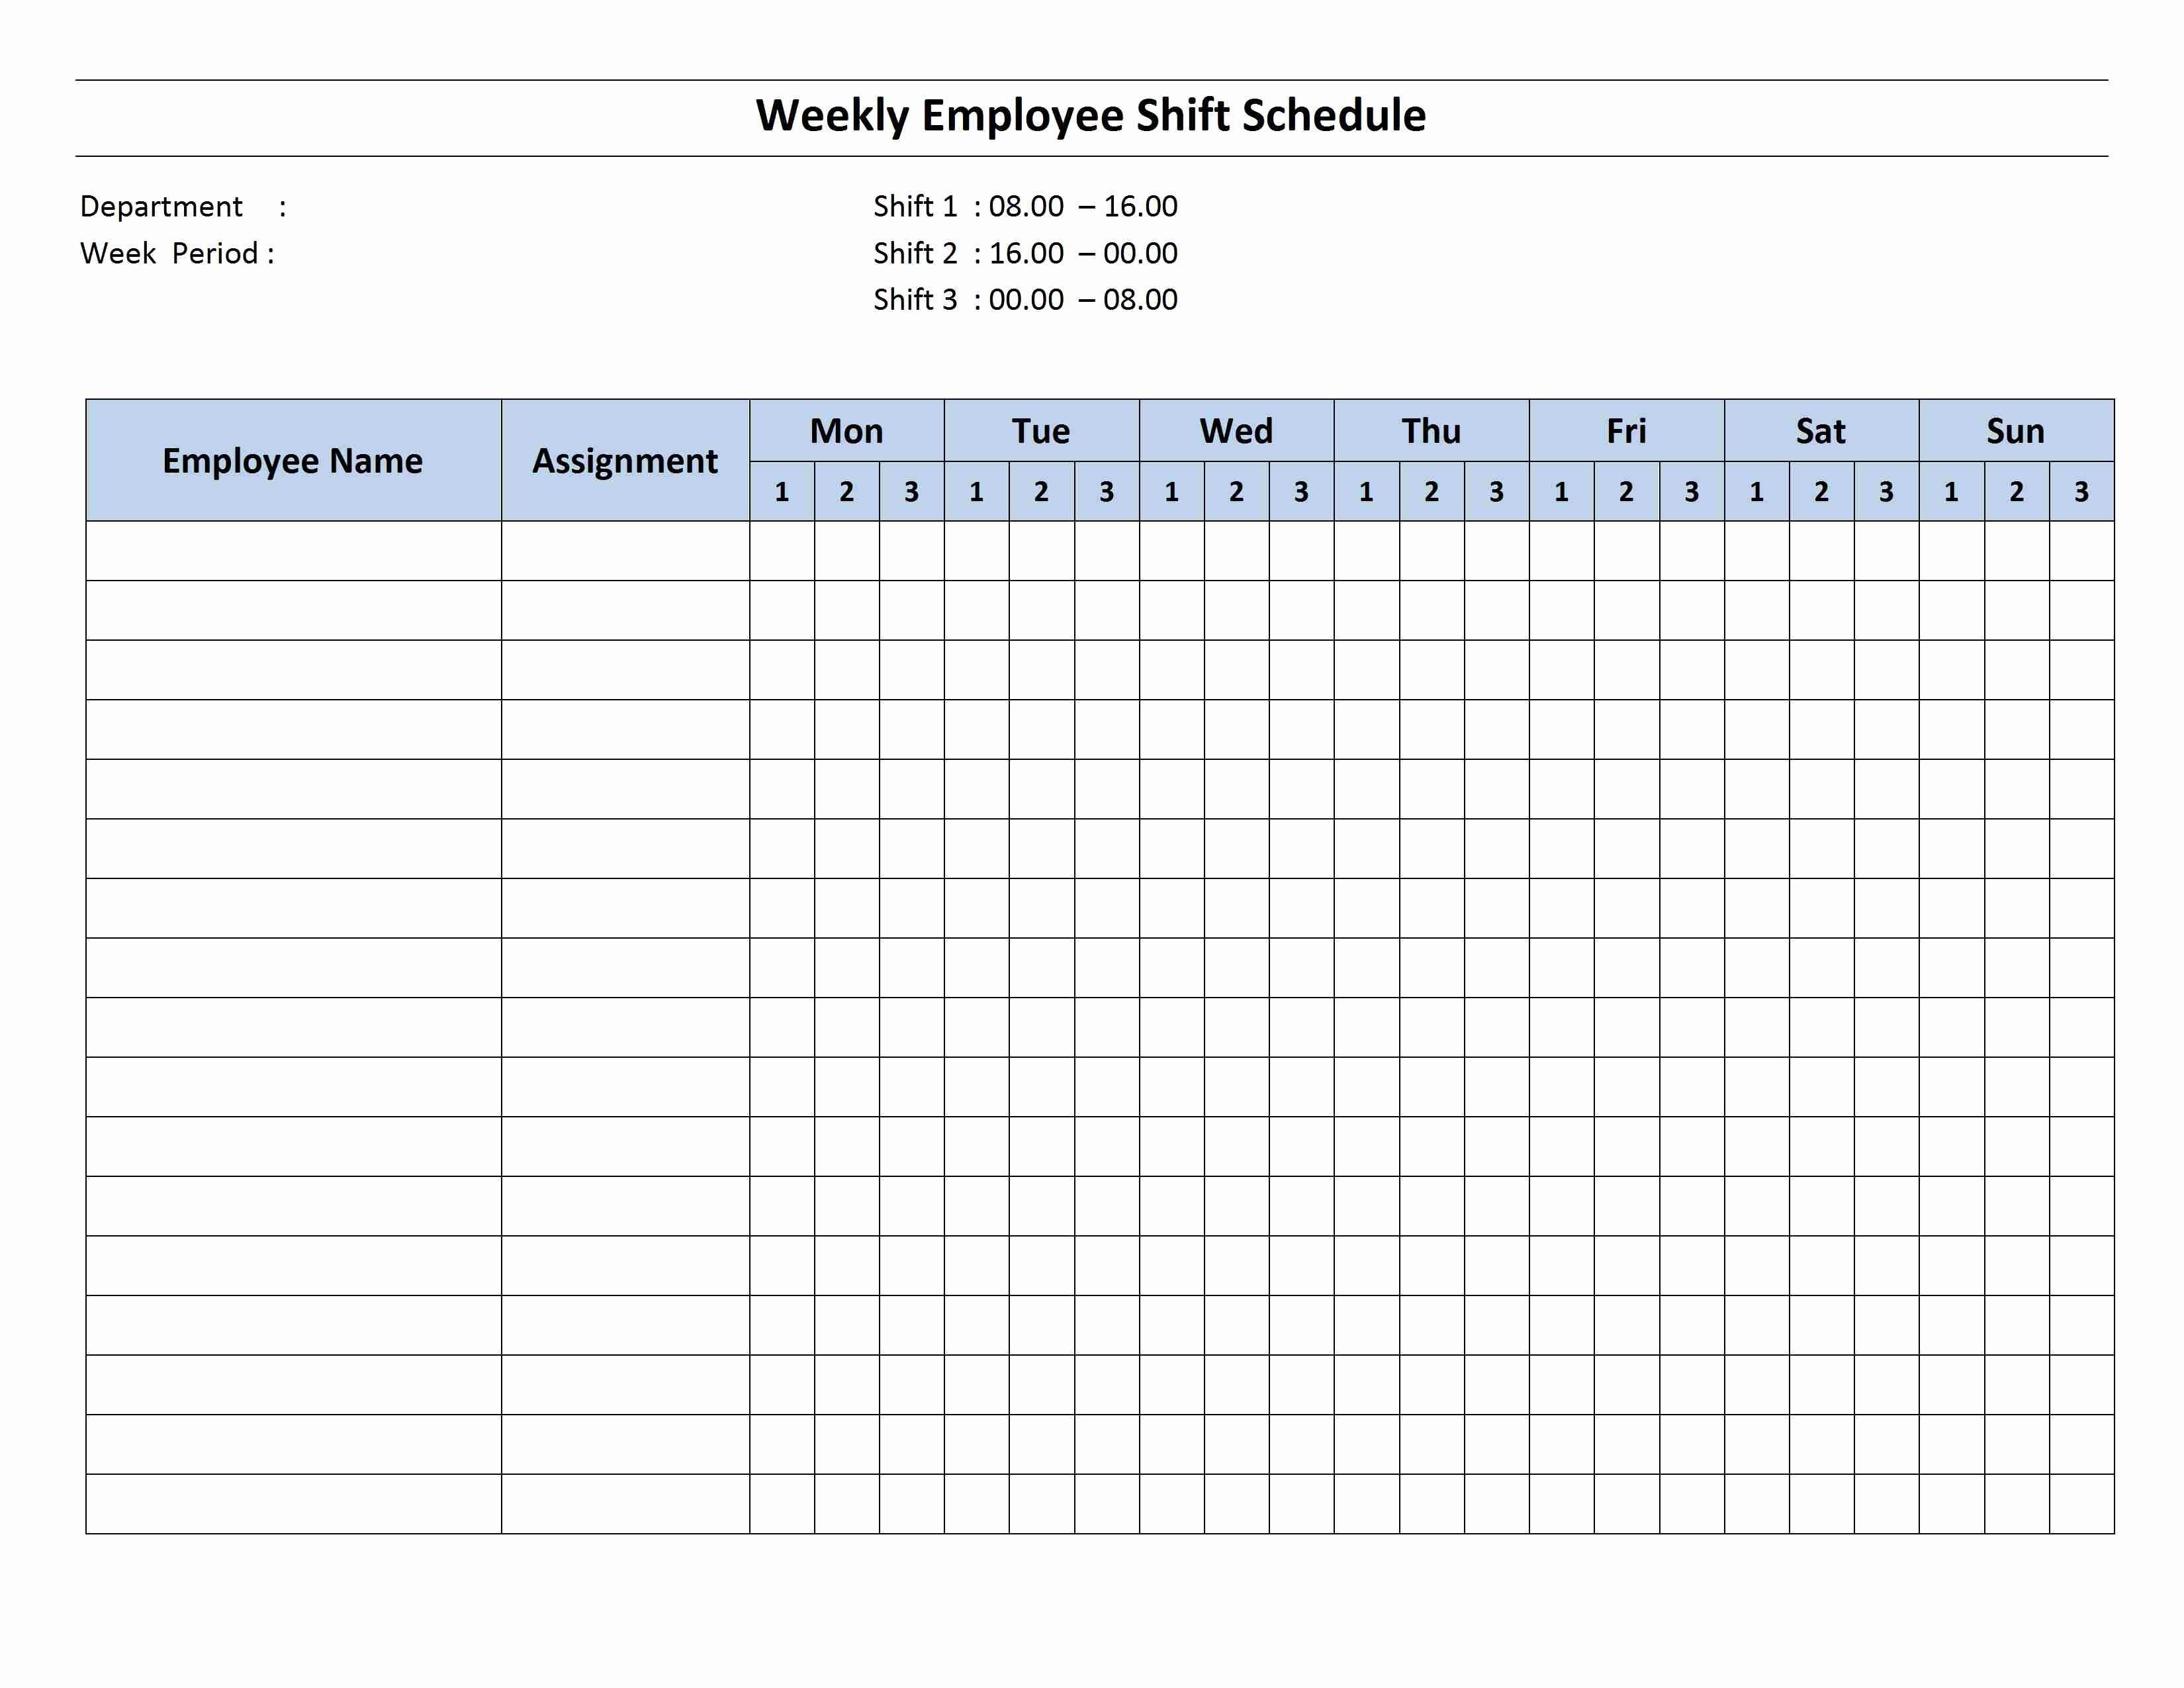 Week Schedule Template Word Luxury Weekly 8 Hour Shift Schedule